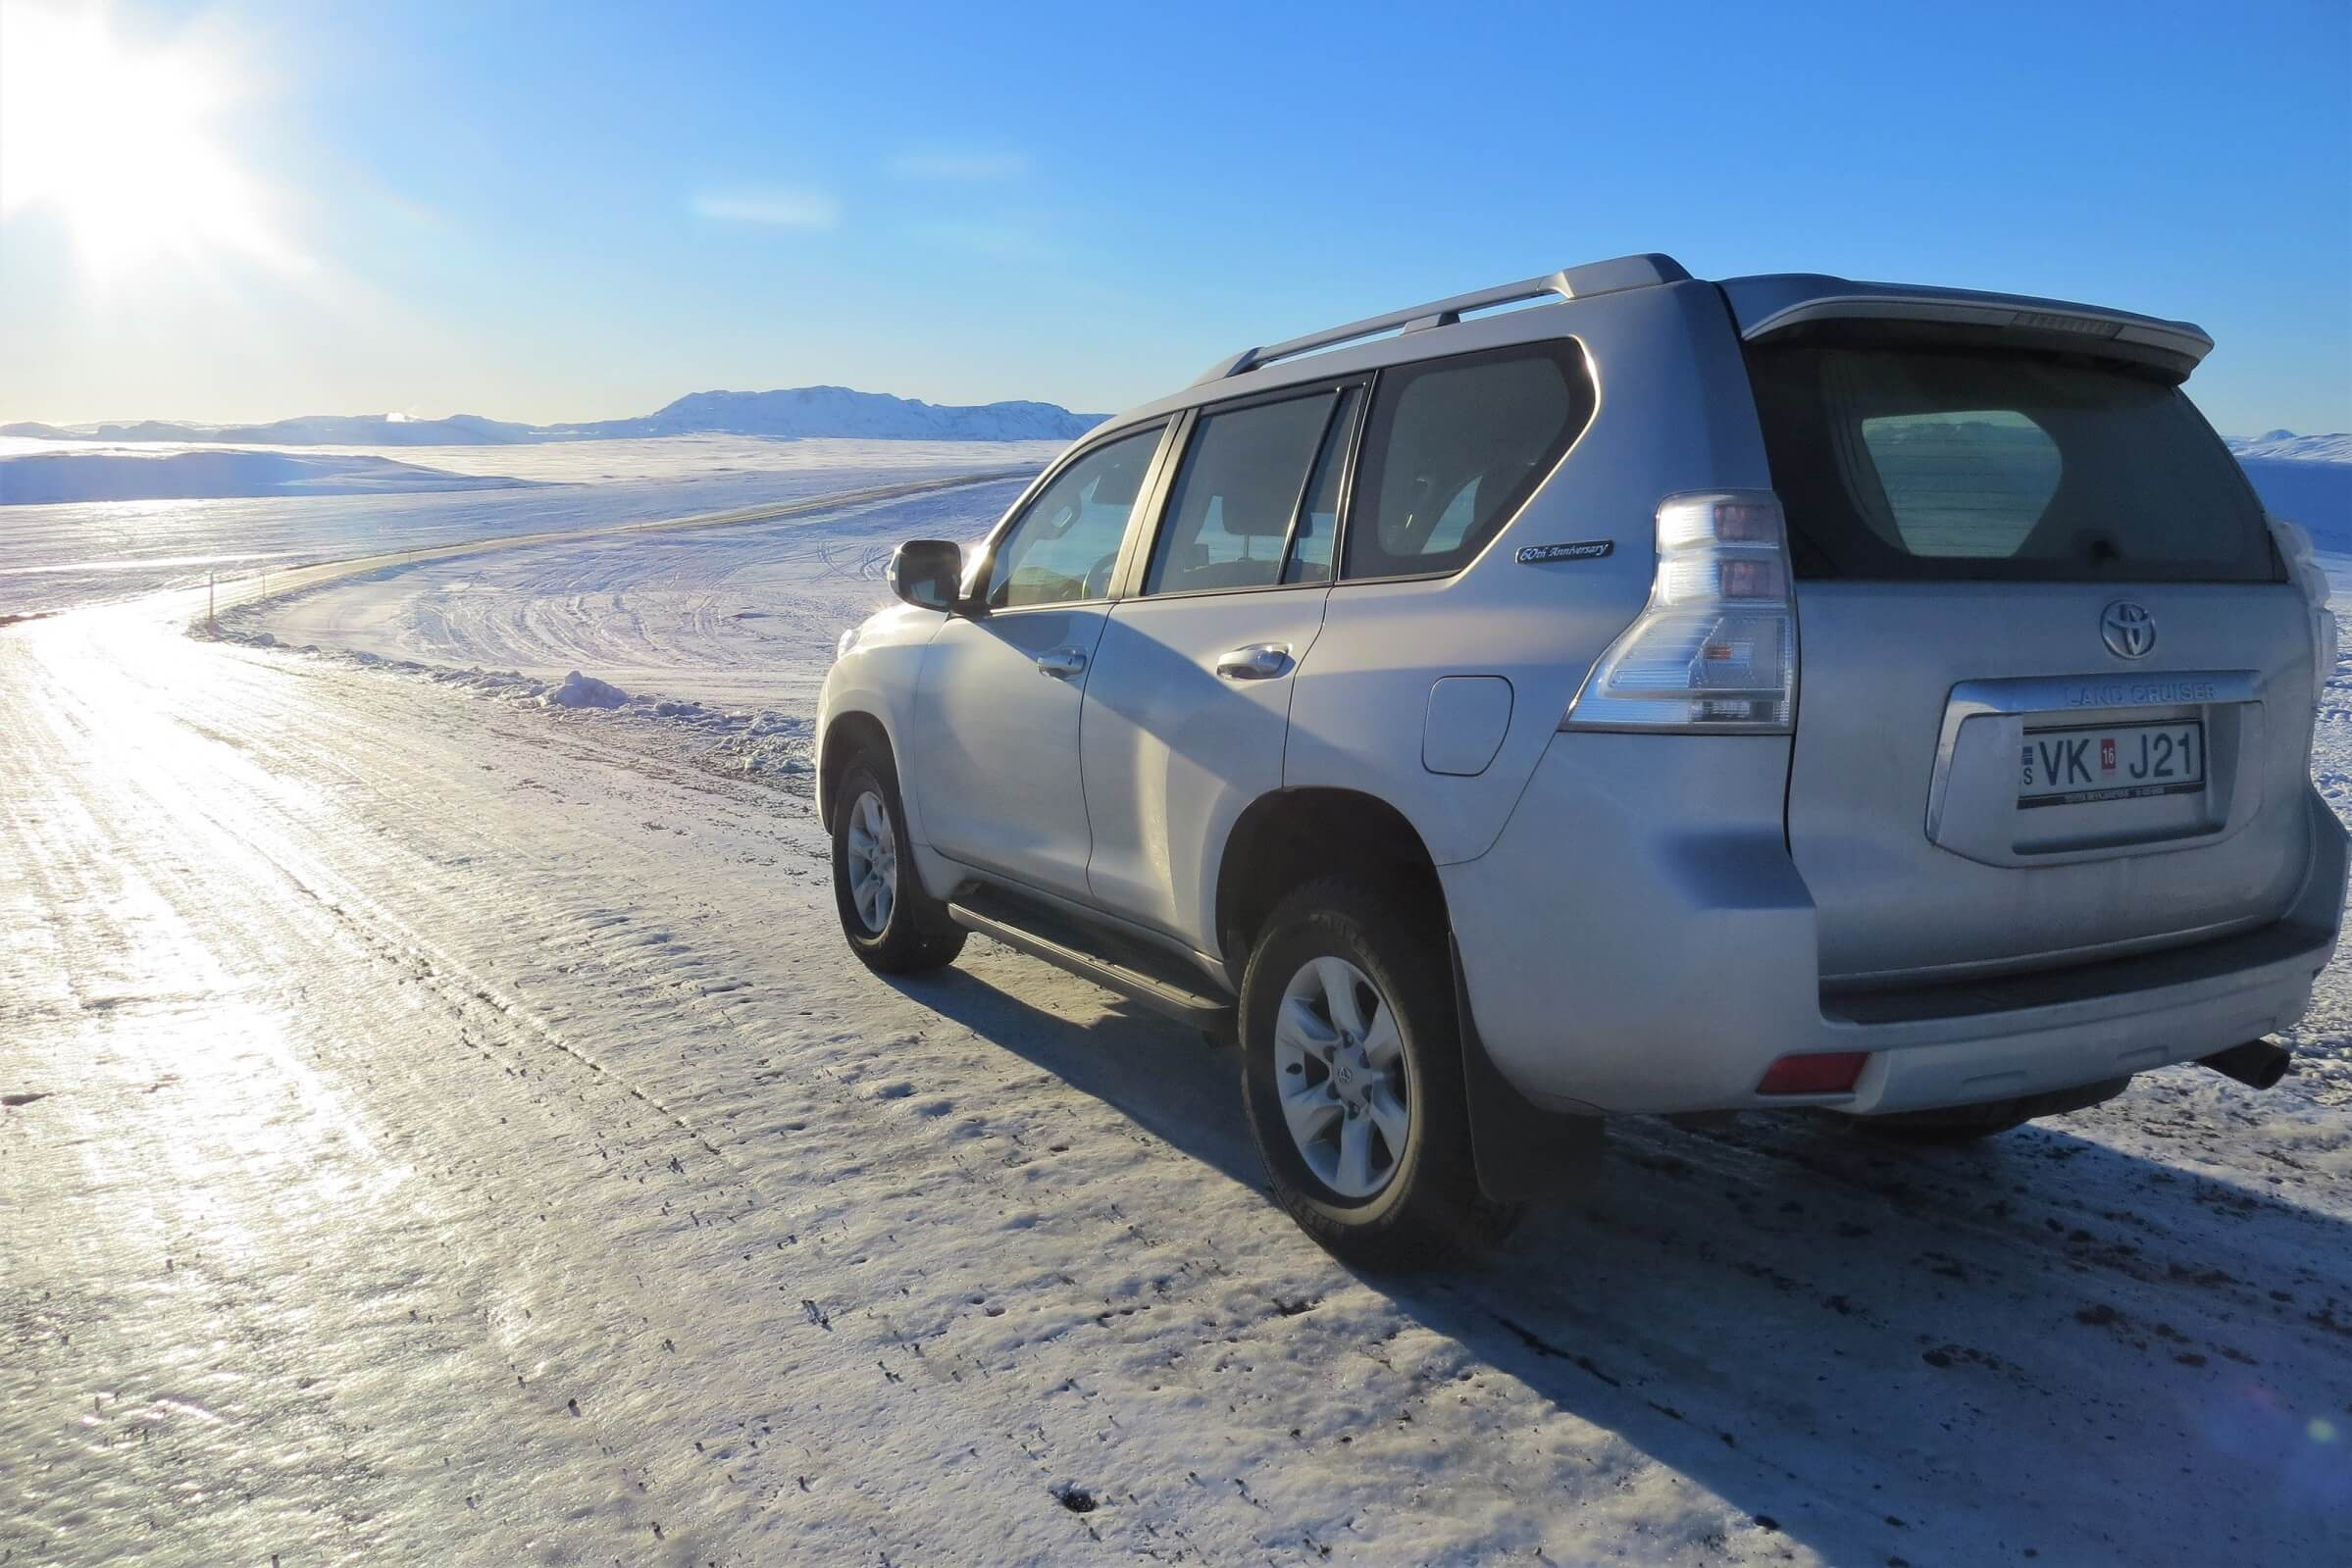 Pronájem auta Toyota Landcruiser na Islandu